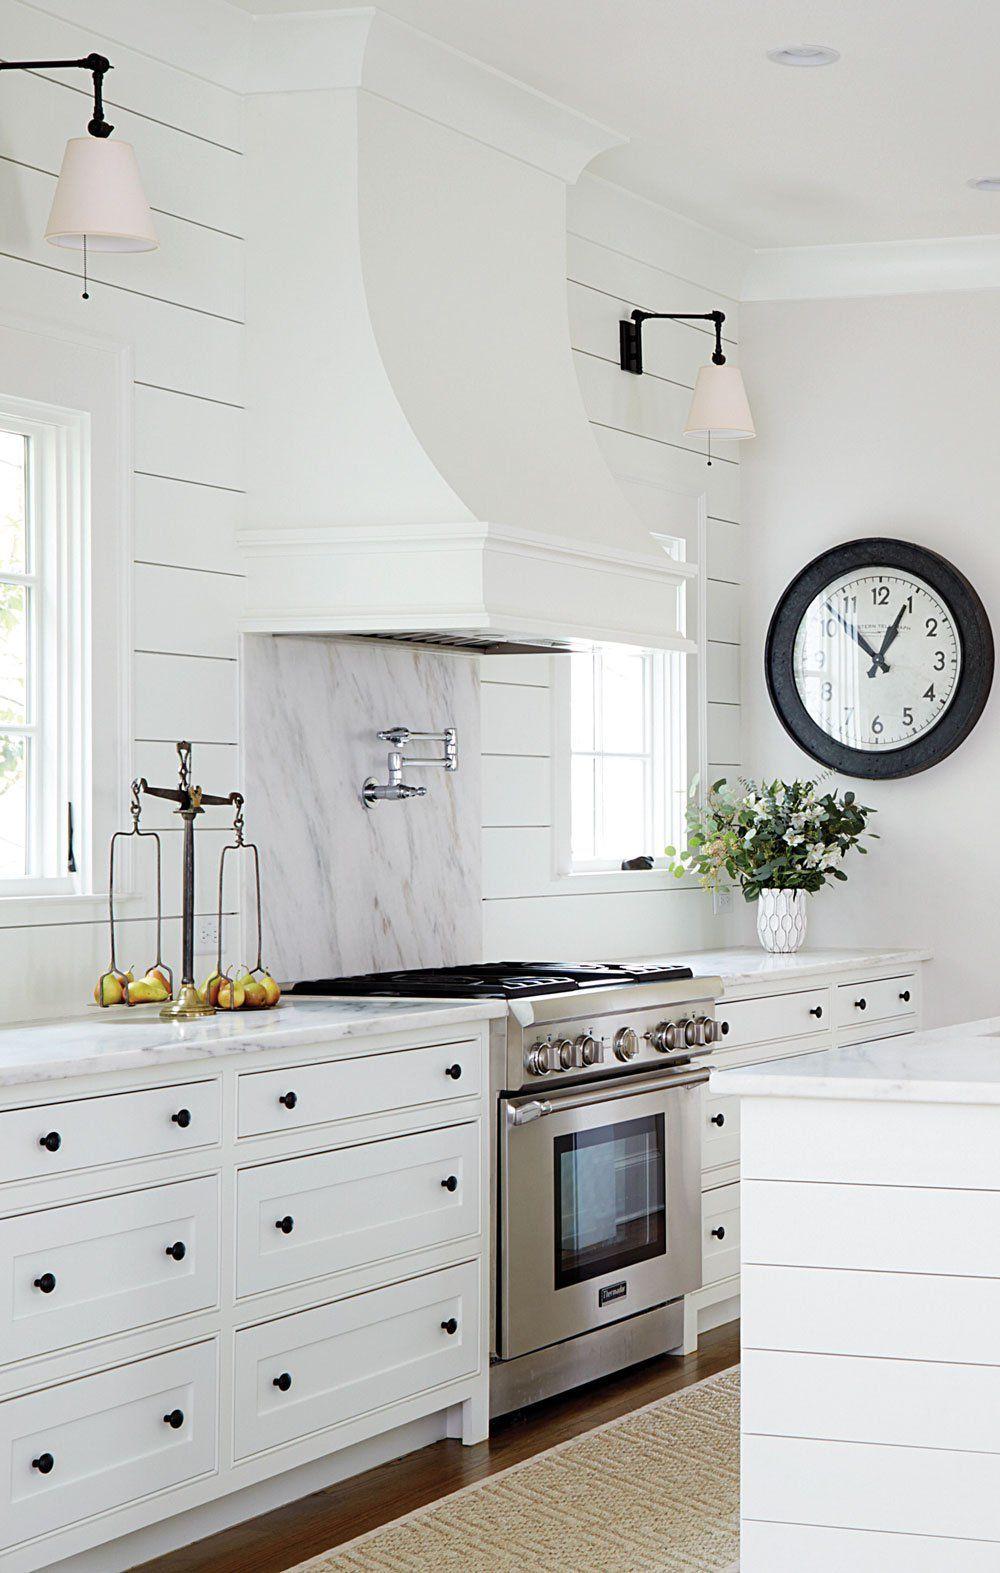 Best Kitchen Gallery: 25 Antique White Kitchen Cabi S For Awesome Interior Home Ideas of White Farmhouse Kitchen Hood Designs on rachelxblog.com